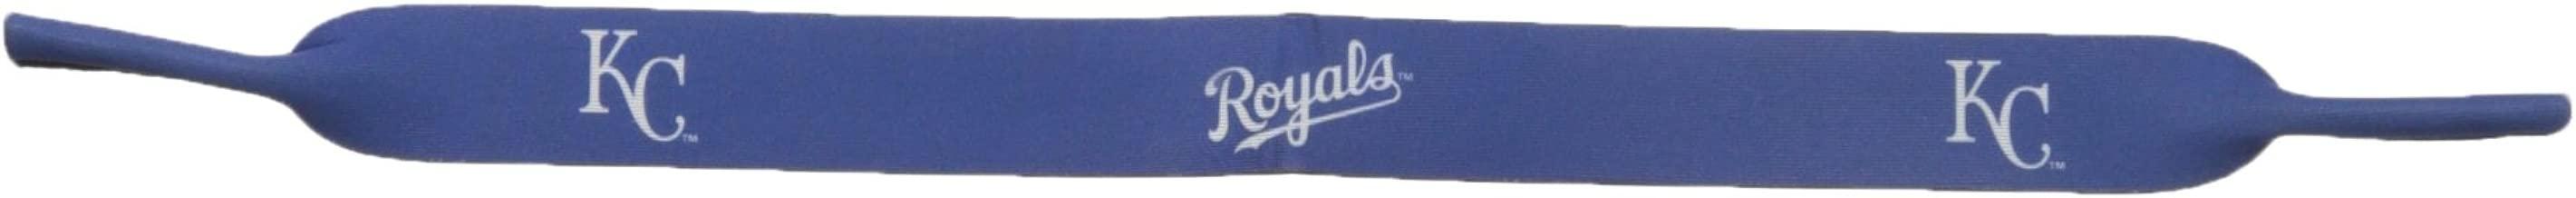 Siskiyou MLB Kansas City Royals Neoprene Sunglass Strap, Blue